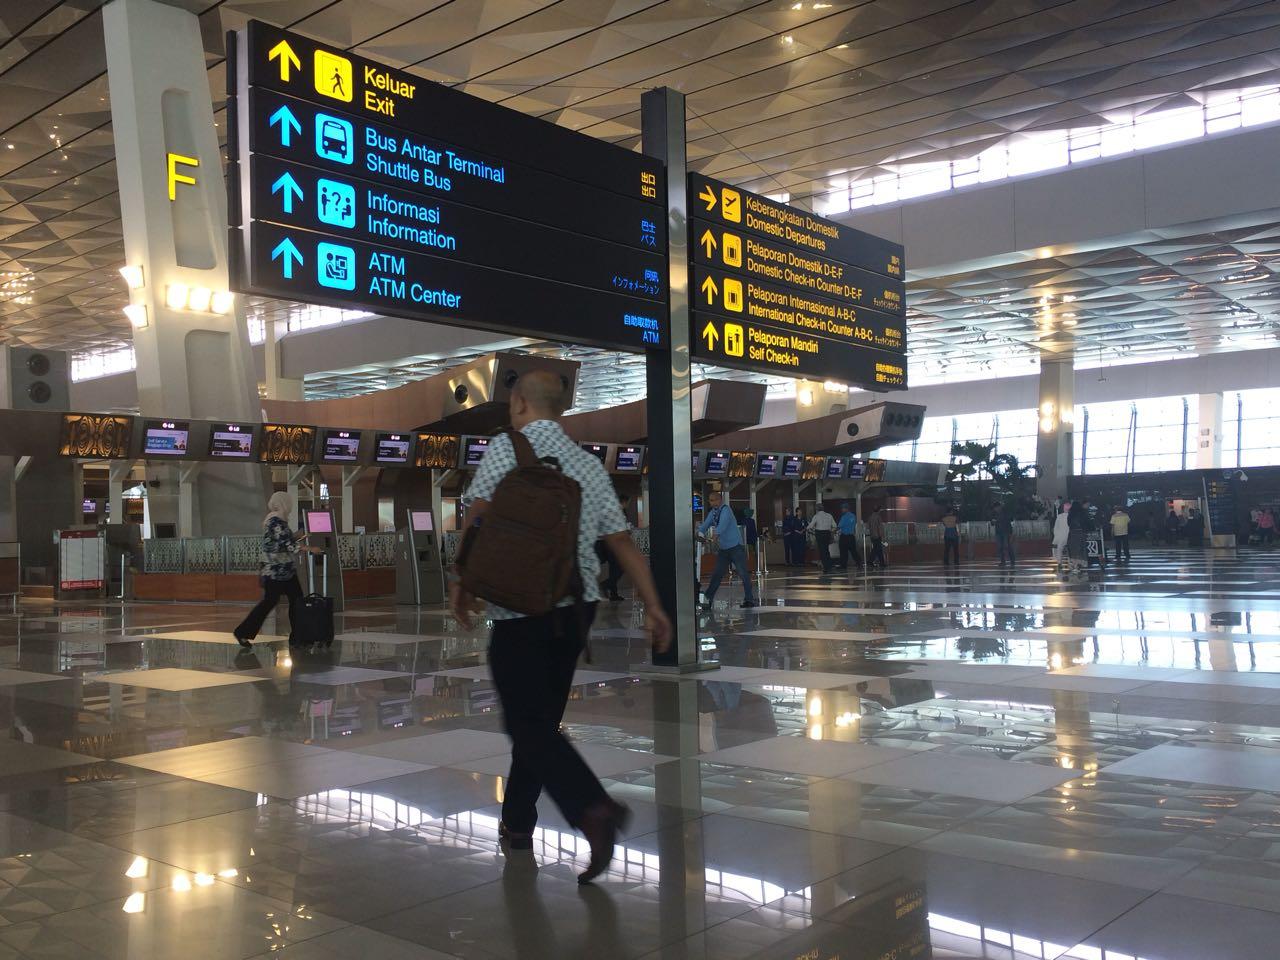 https: img-o.okeinfo.net content 2018 04 16 320 1887108 sambut-114-pesawat-proyek-runway-3-bandara-soetta-selesai-2019-dFFvHPkl4k.jpg